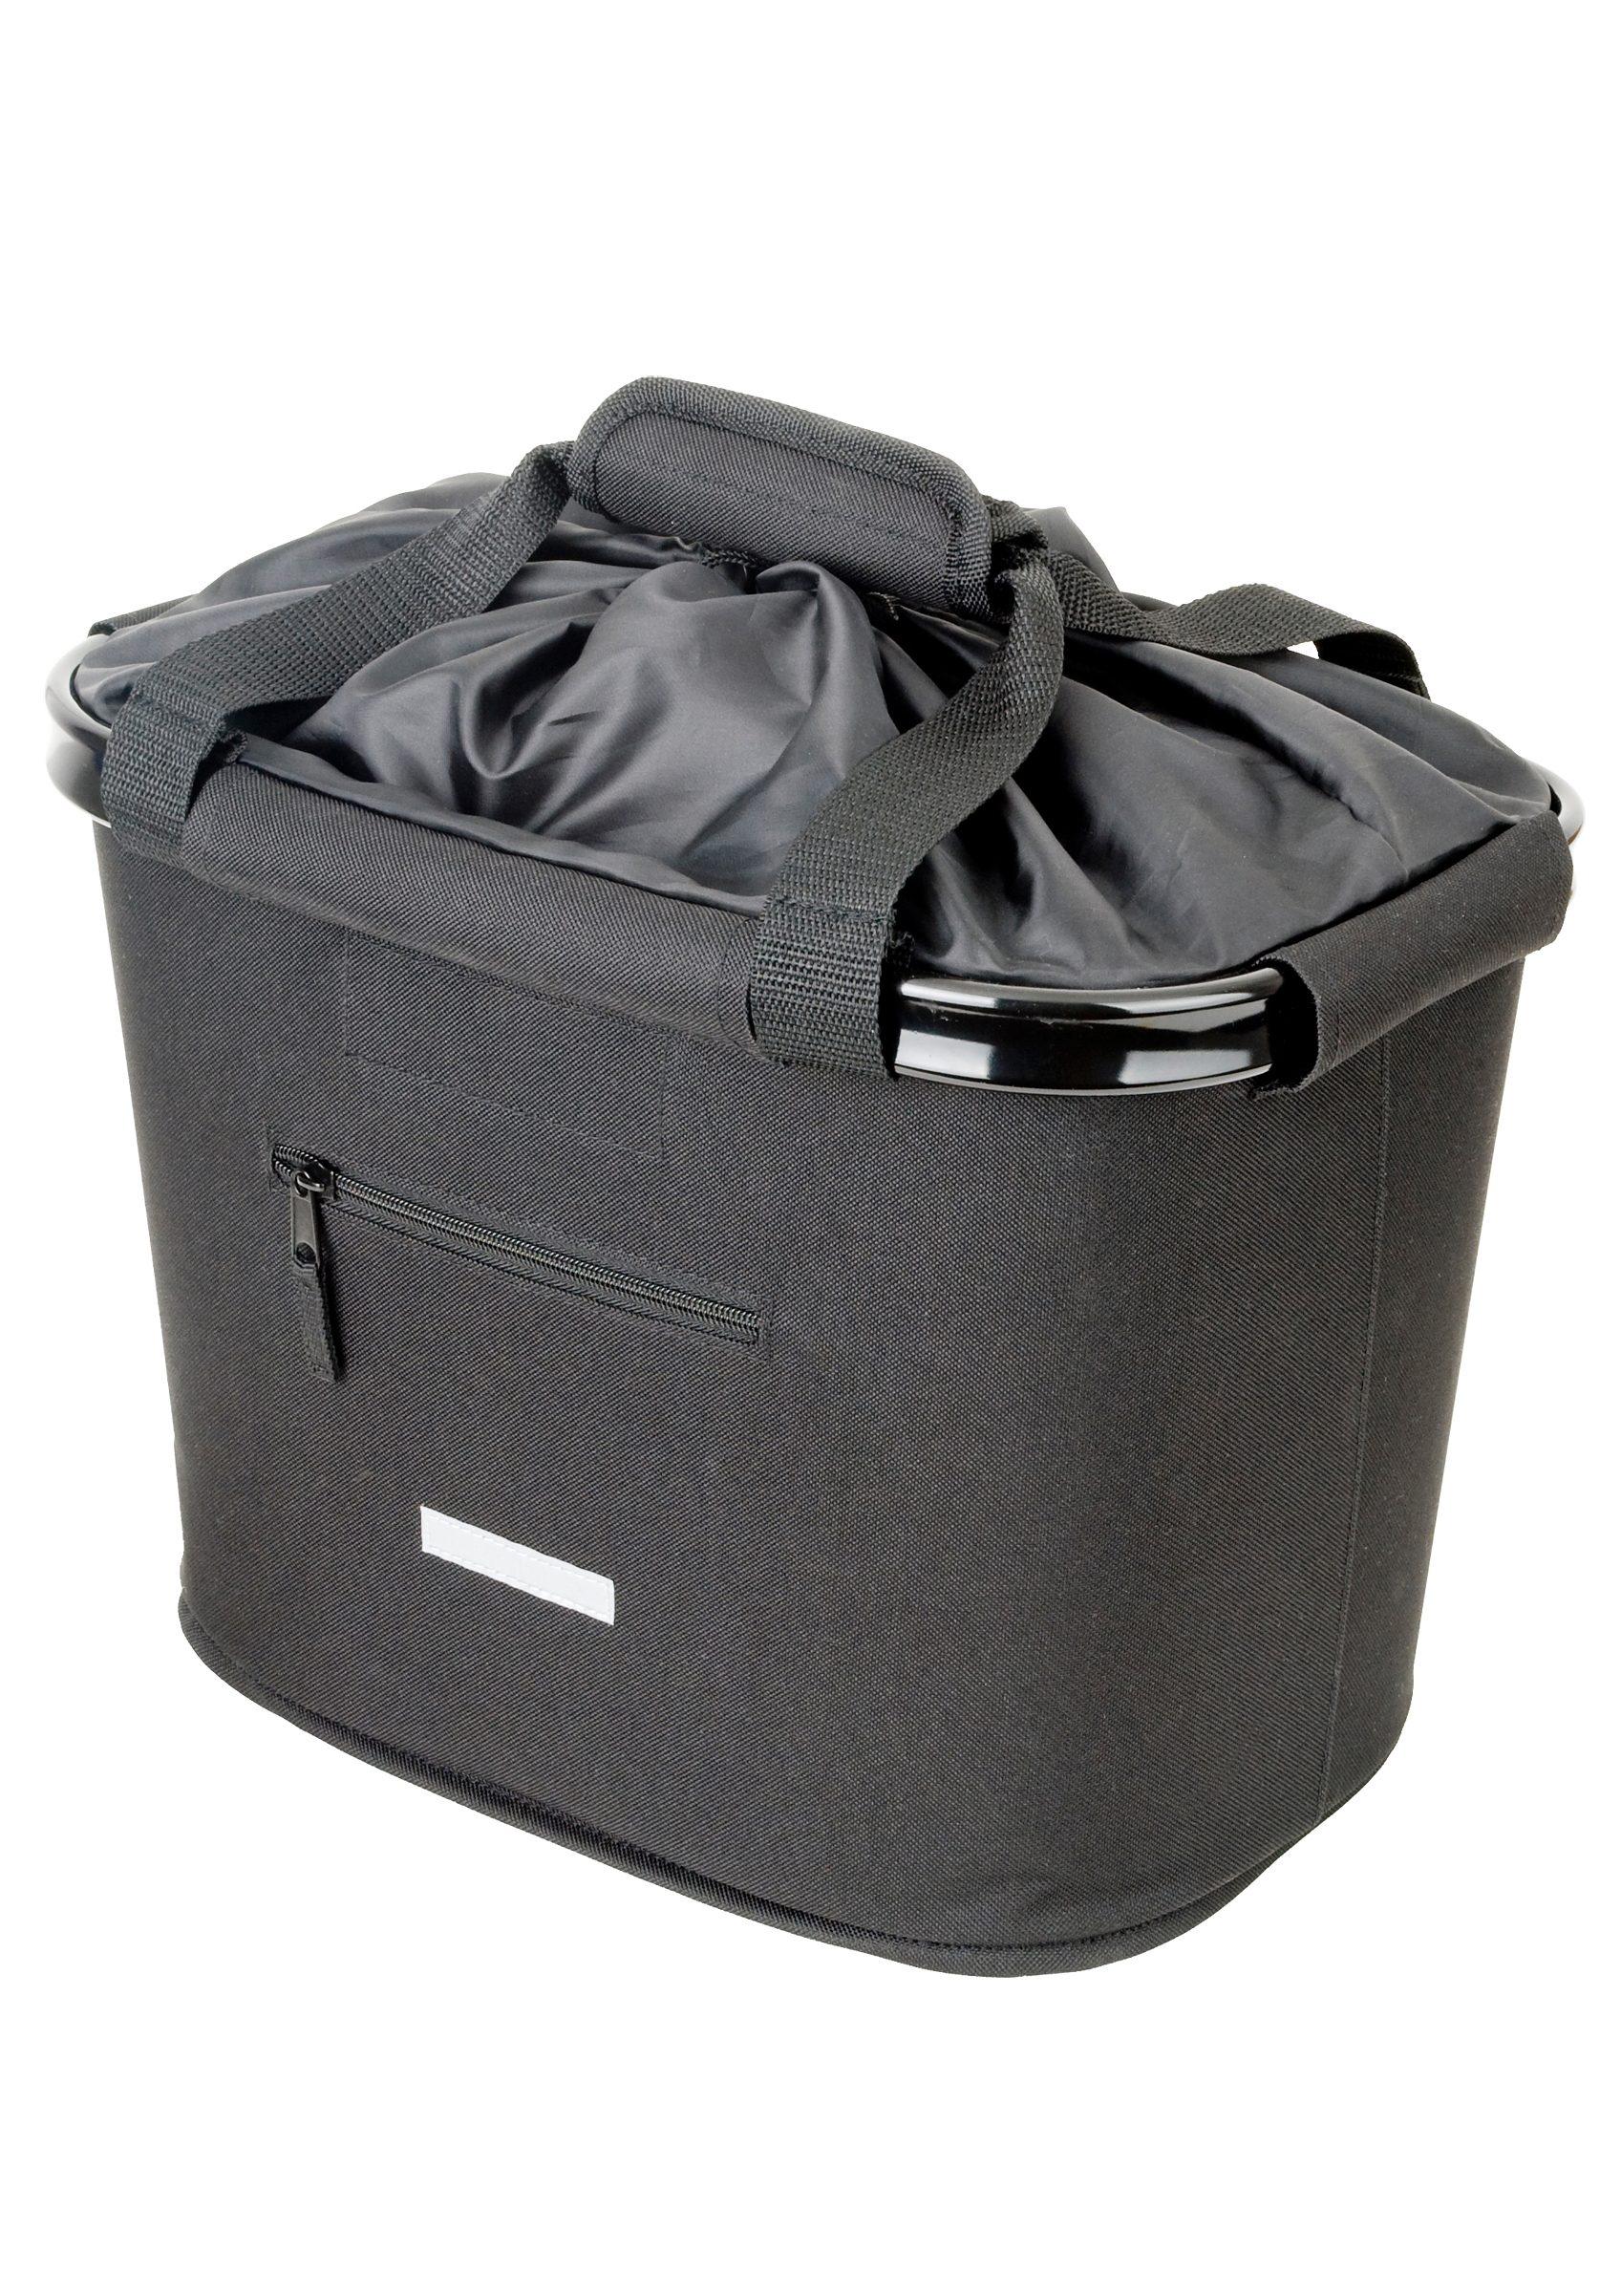 fahrrad taschen b ro f r damen online kaufen damenmode. Black Bedroom Furniture Sets. Home Design Ideas